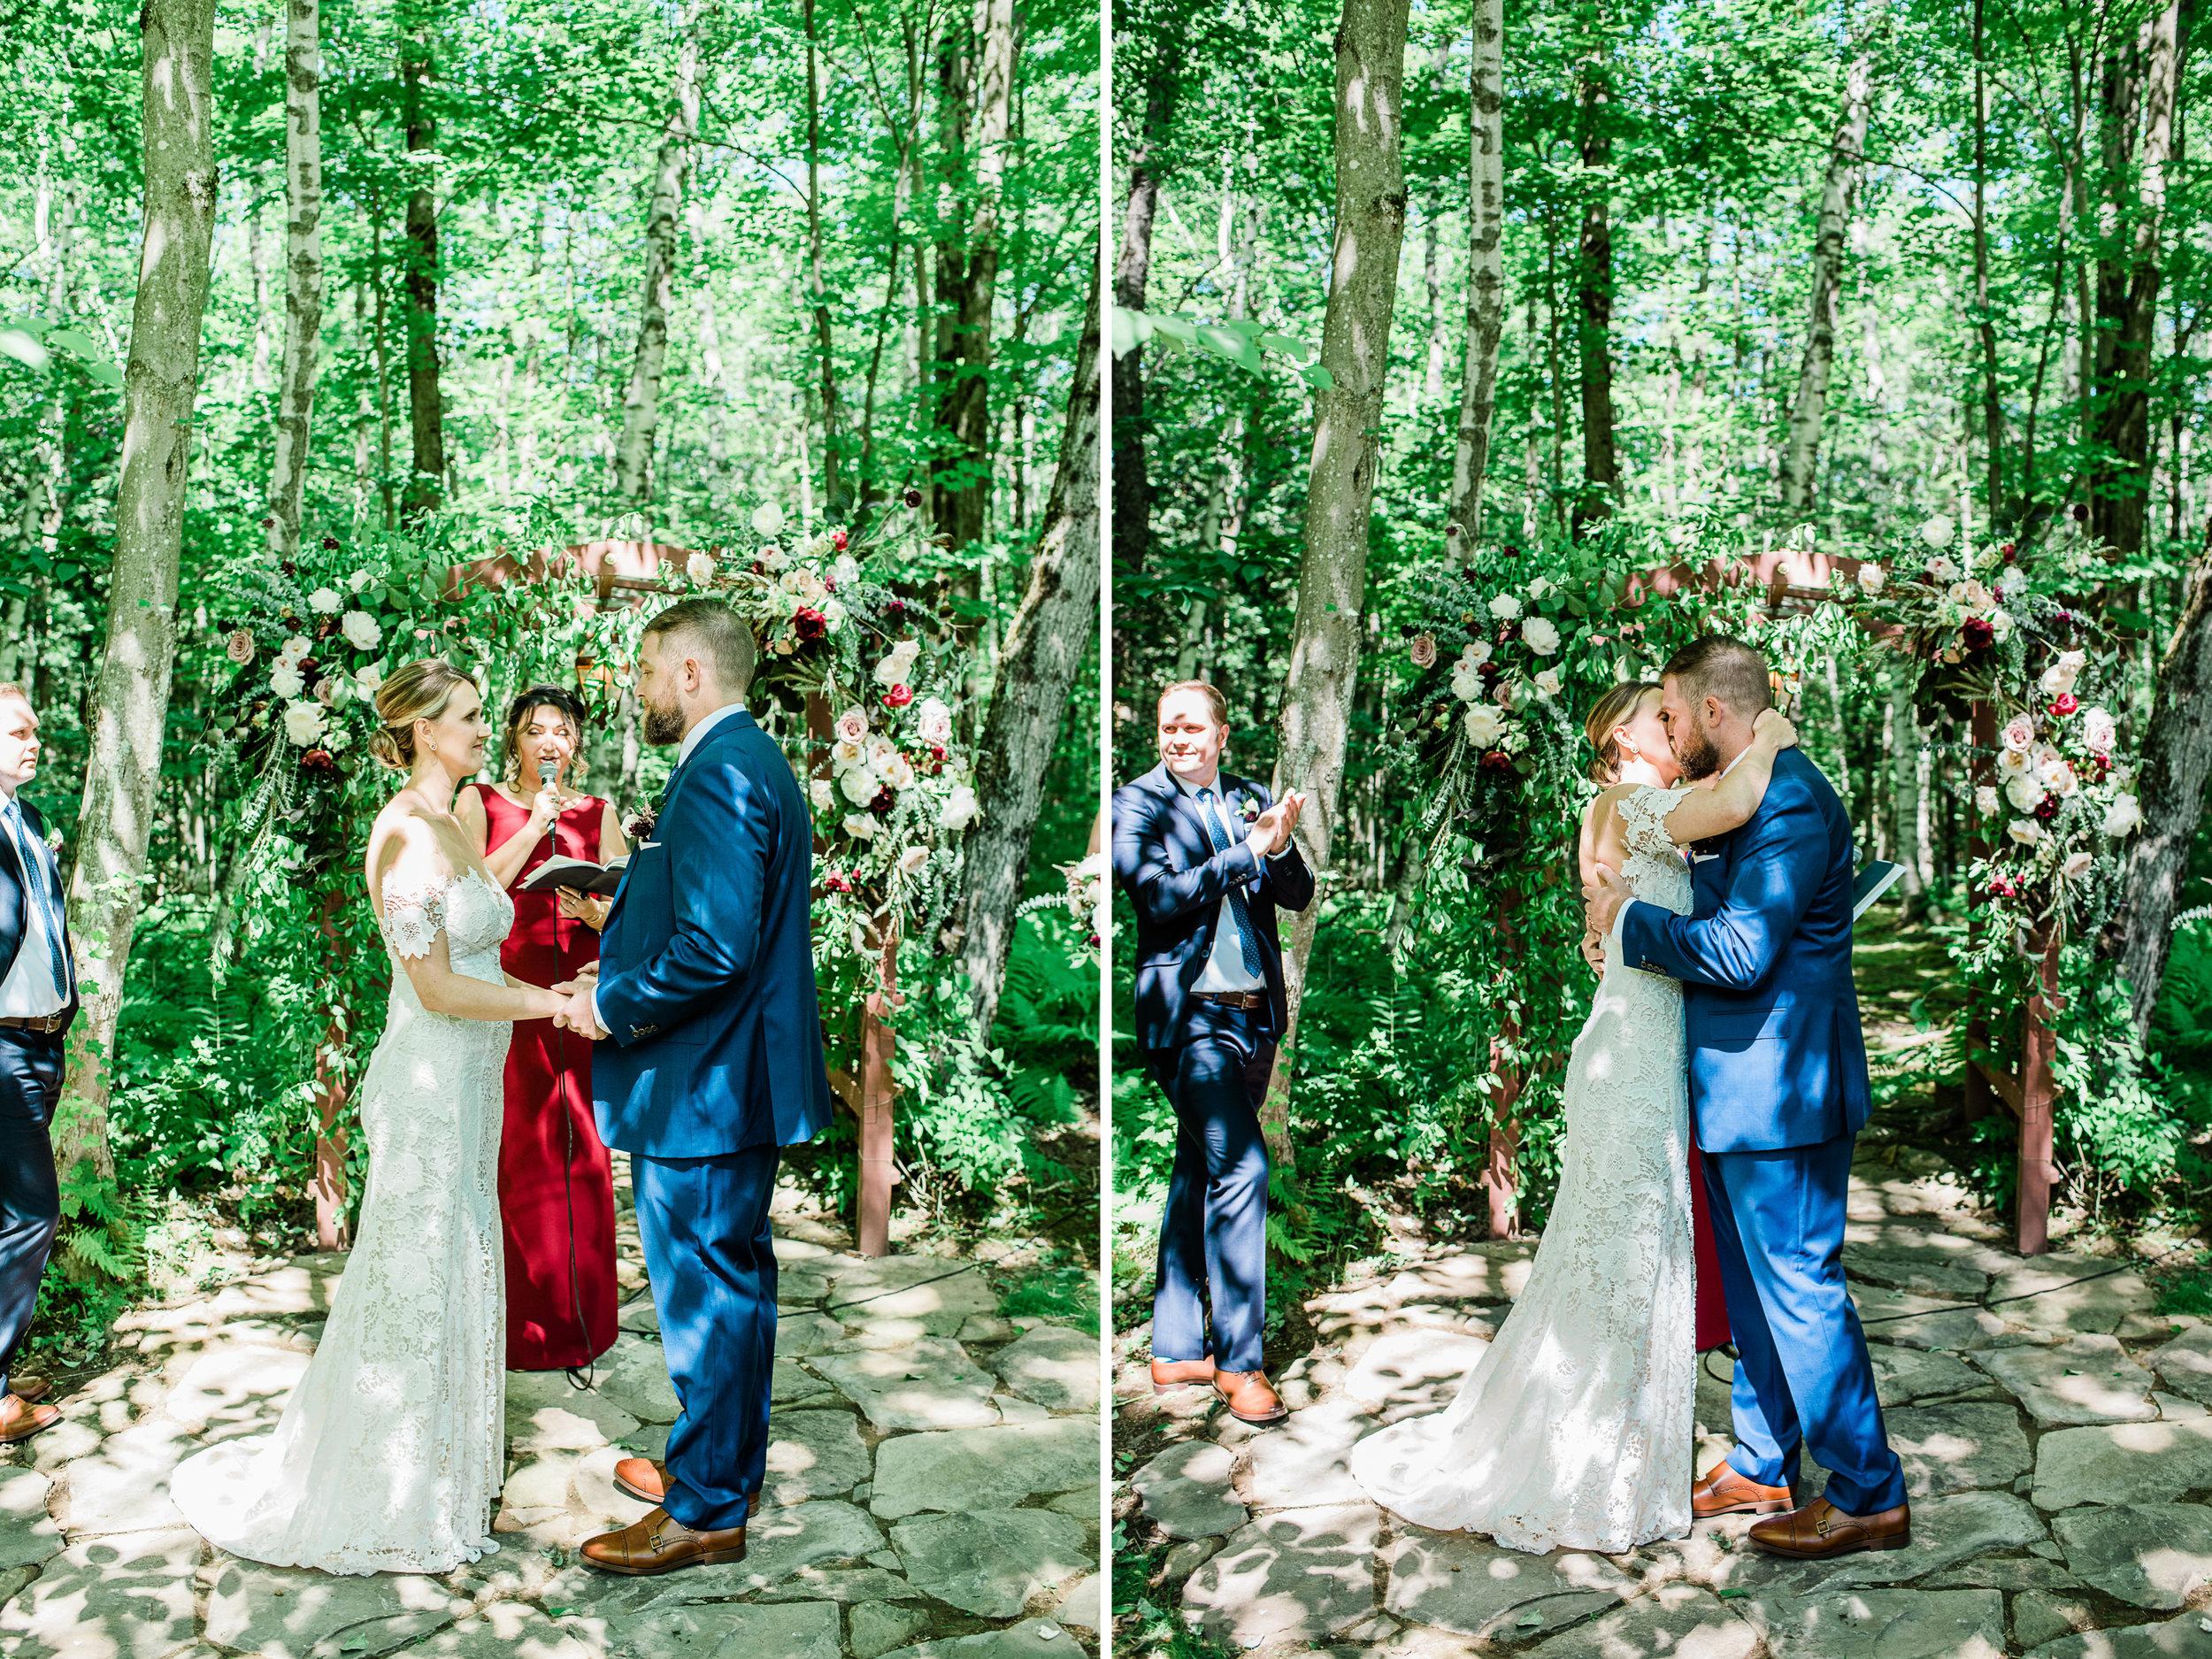 Intimate Wedding Photographer near Stockbridge MA